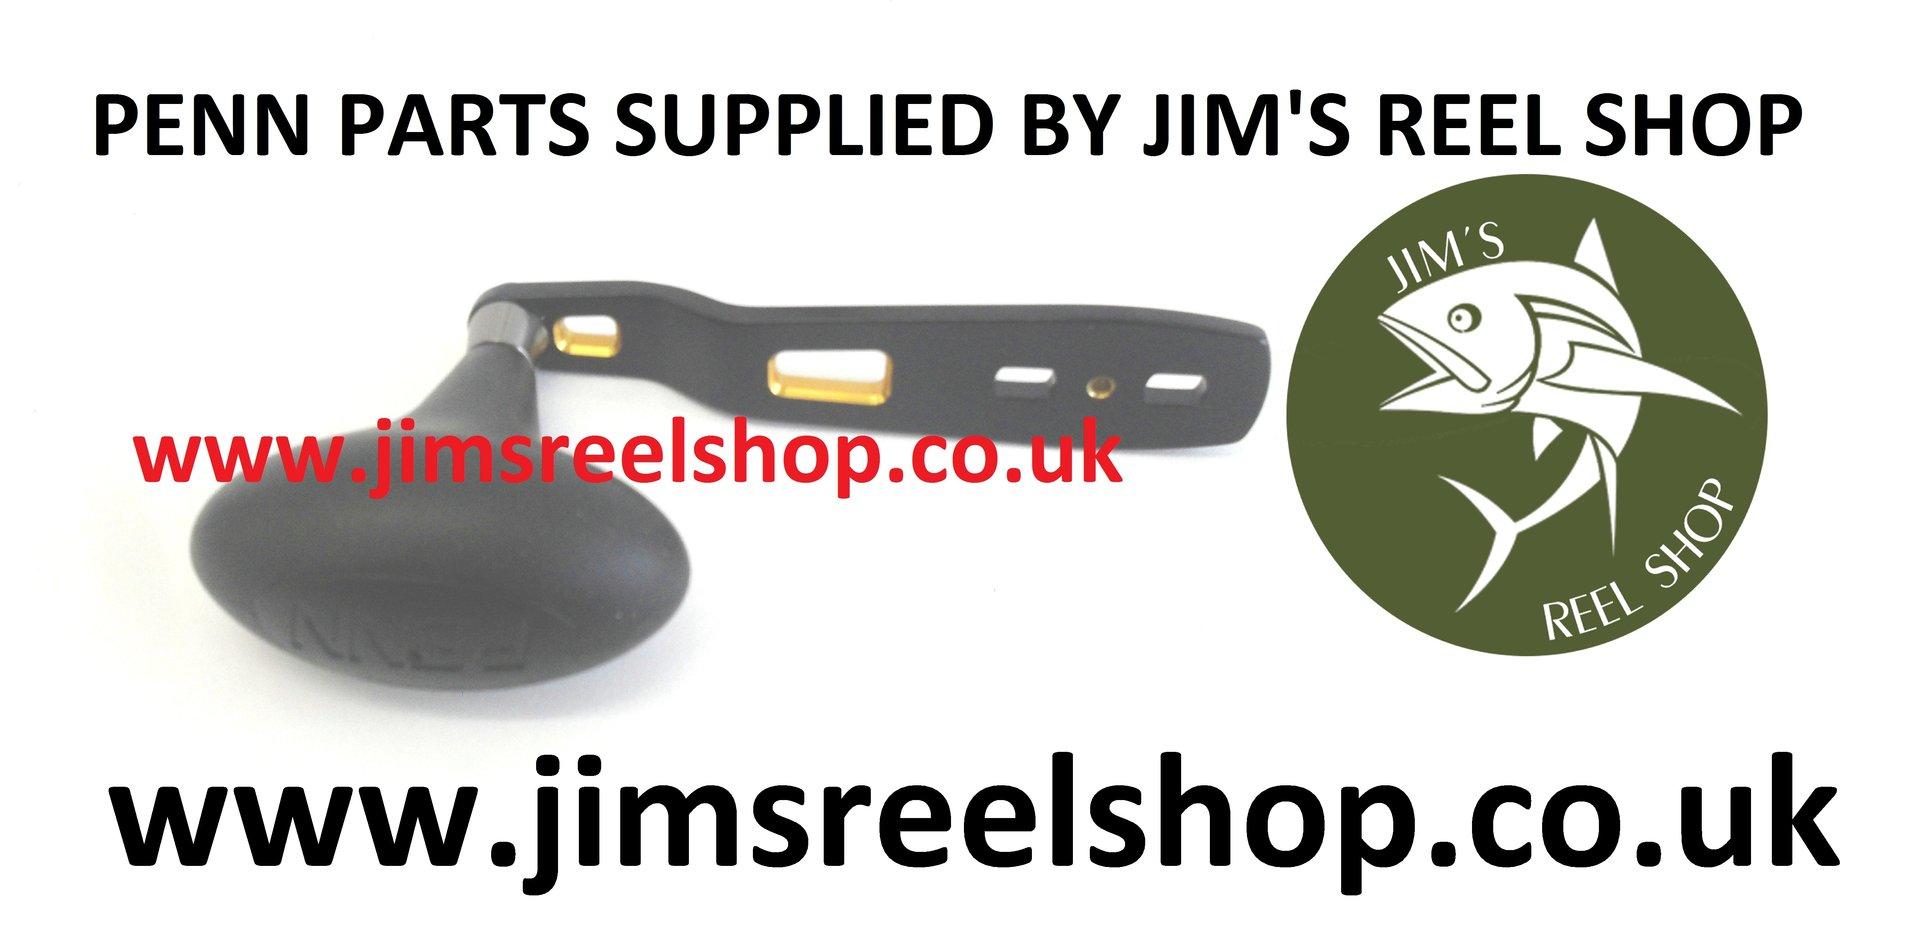 Penn Squall Lever Drag Handle 24 Trq40 1229501 Jims Reel Shop Parts Diagram